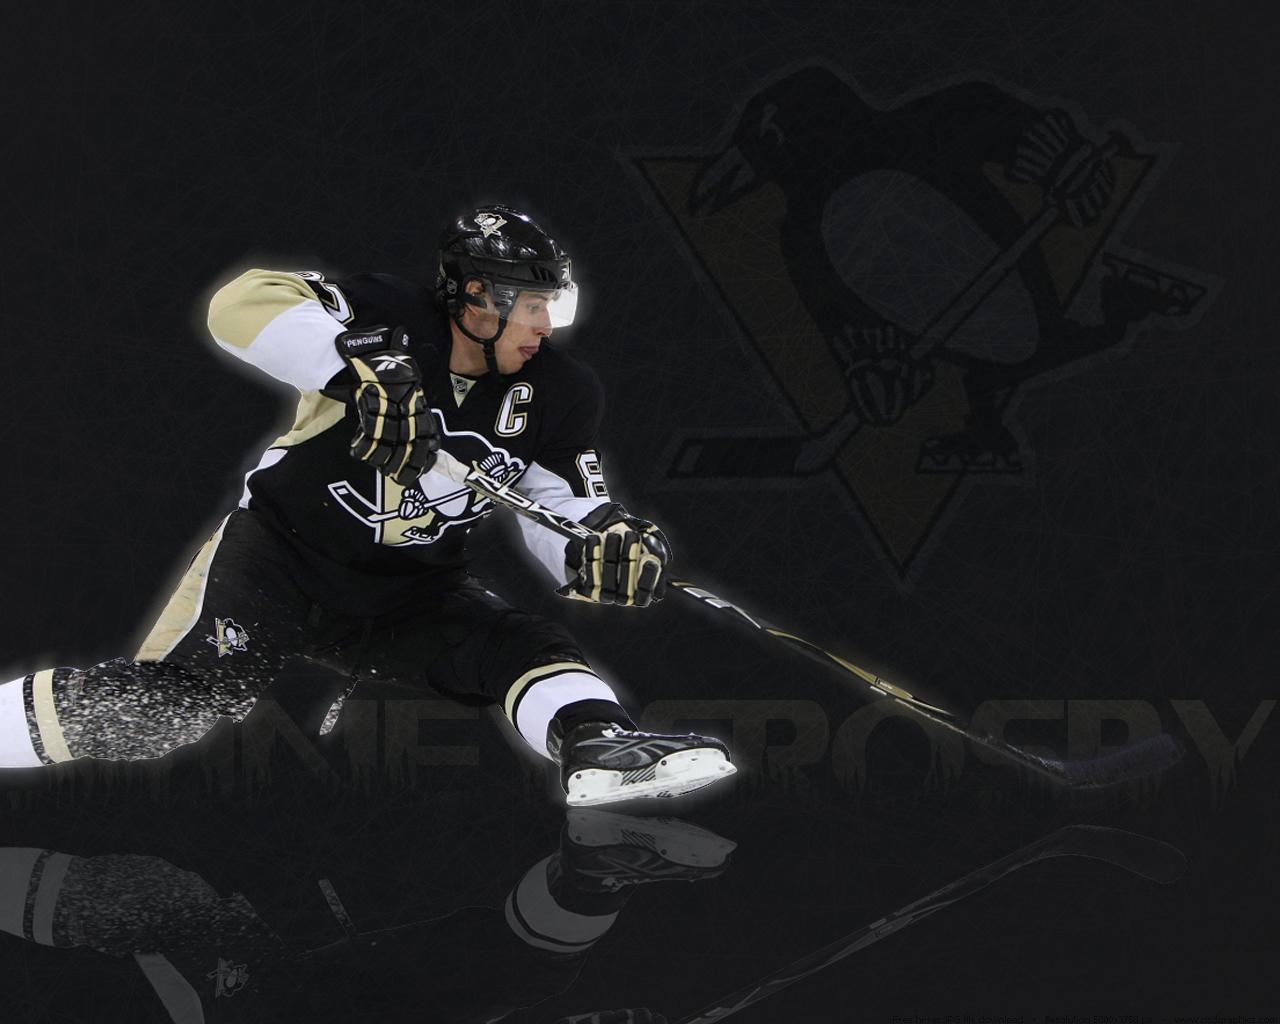 Sidney Crosby Wallpaper 1280x1024